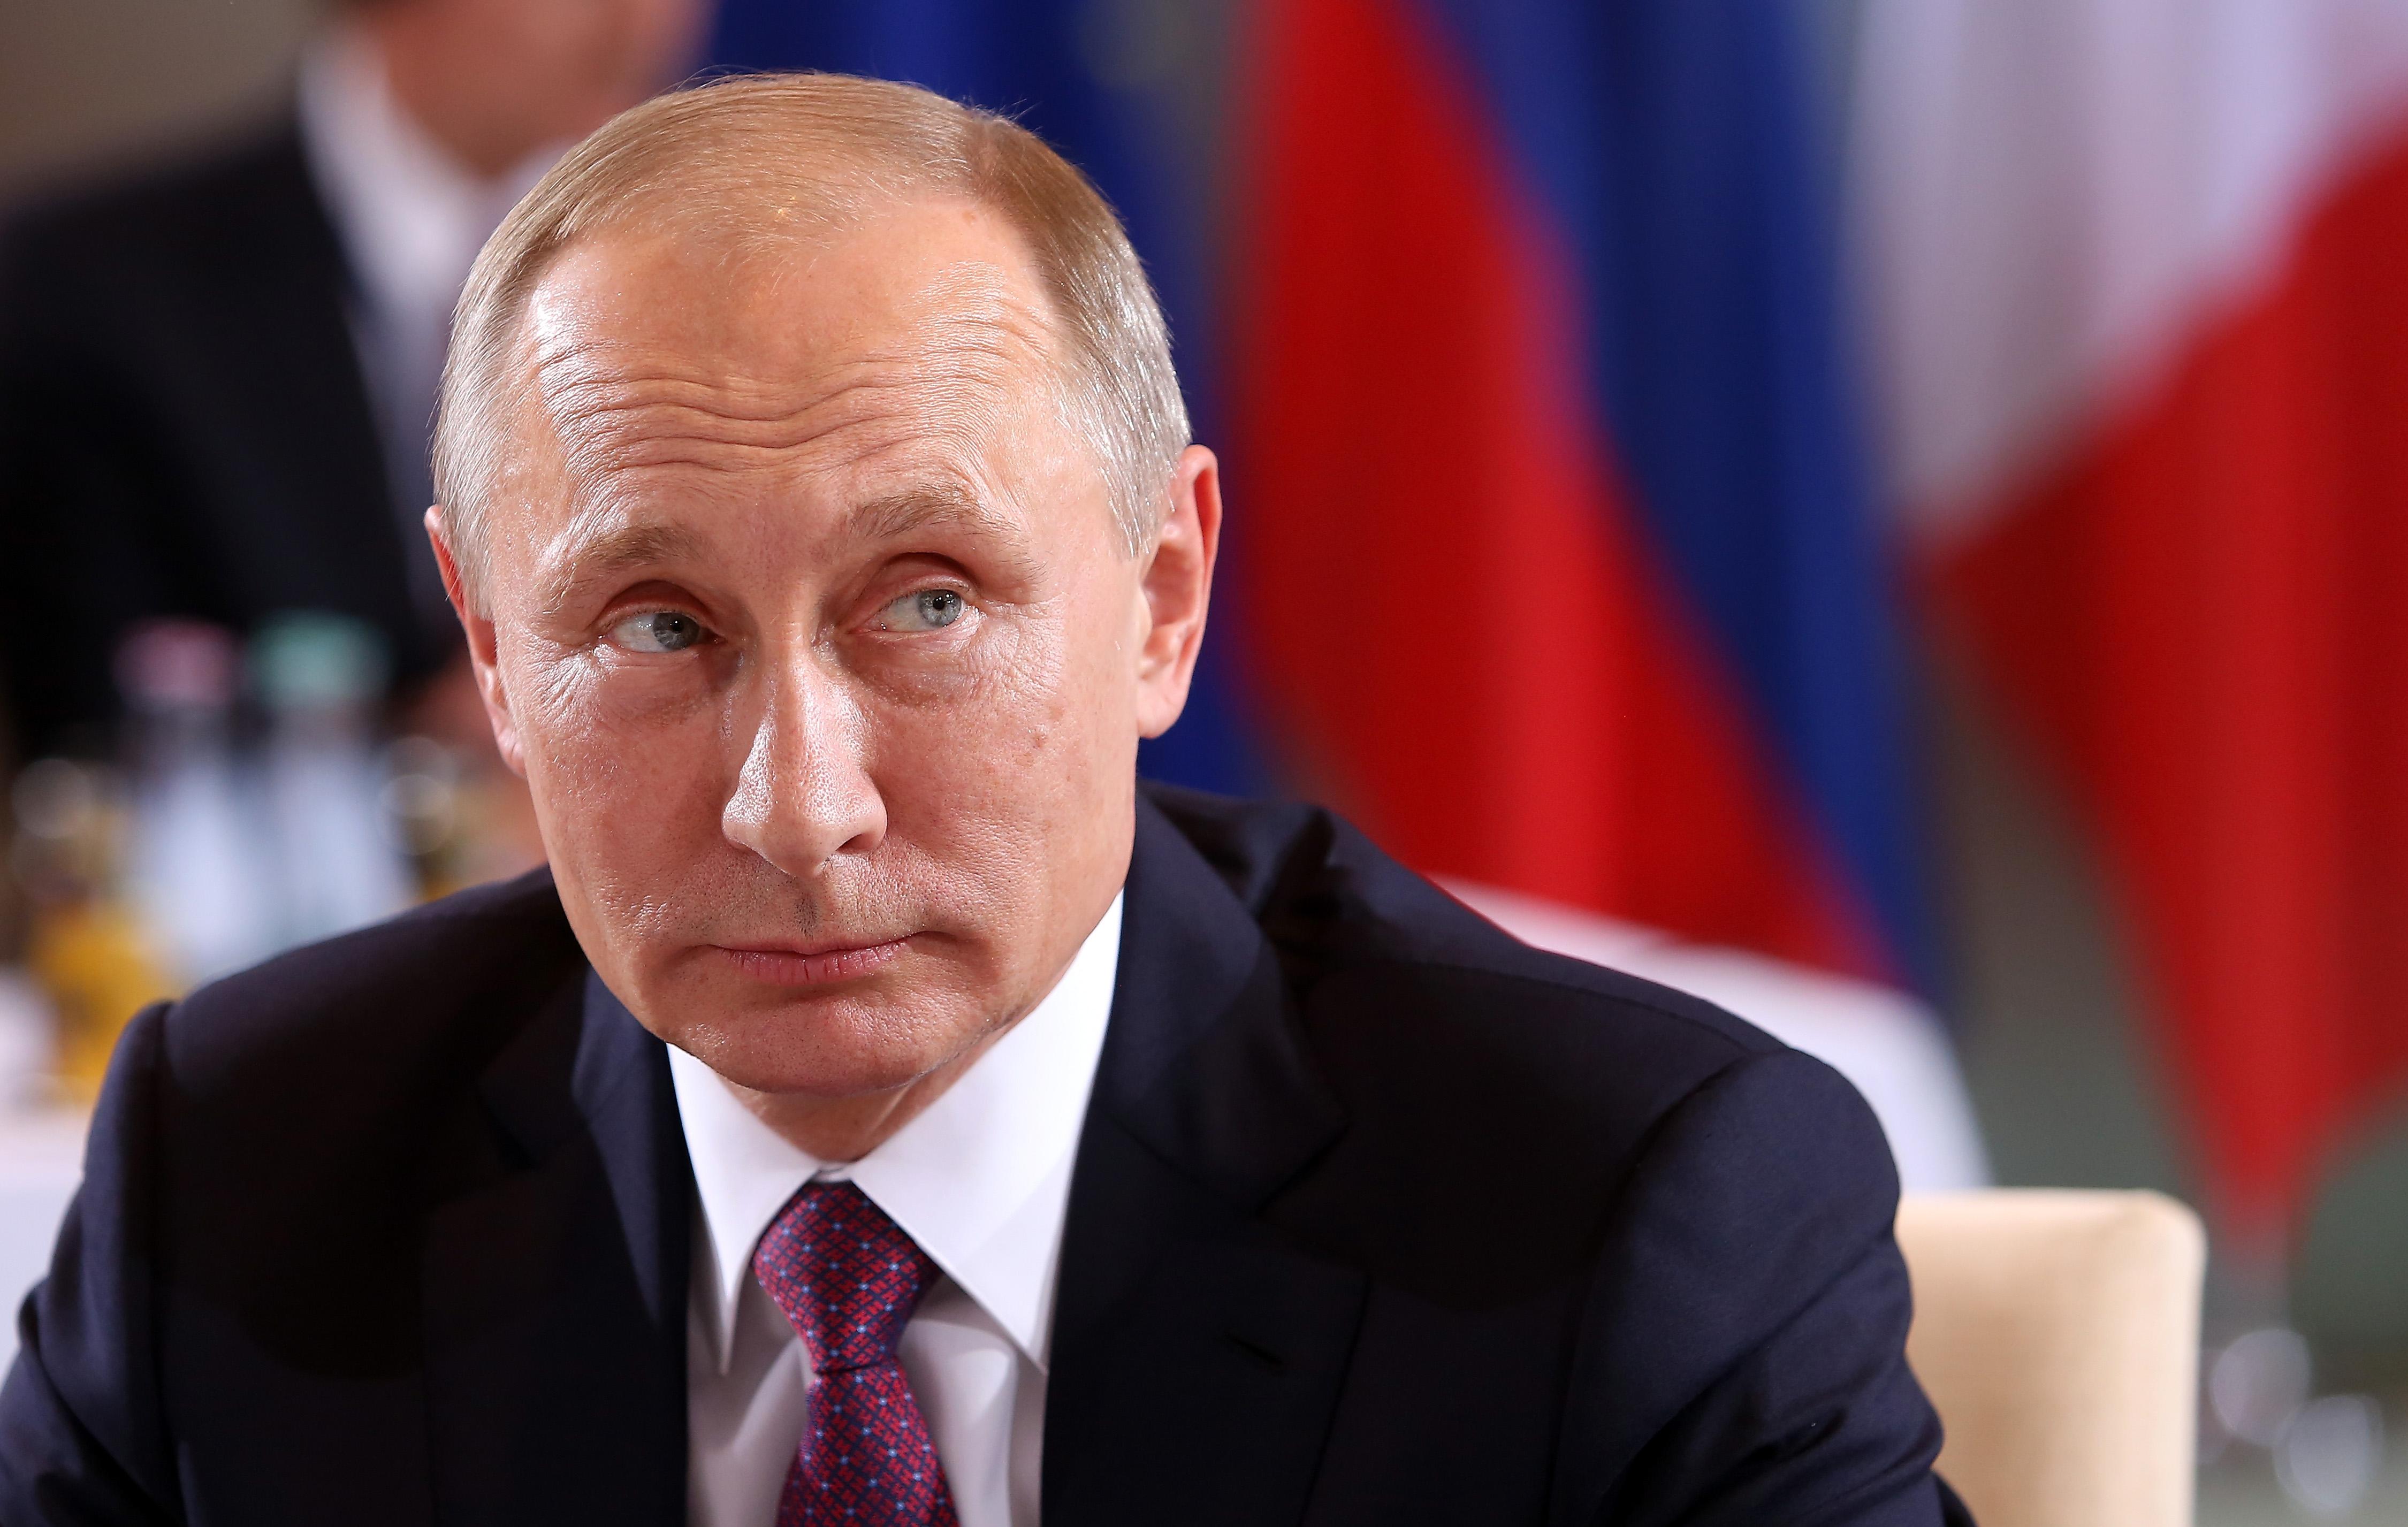 Putin, Hollande, Merkel And Poroshenko Meet Over Ukraine Peace Plan